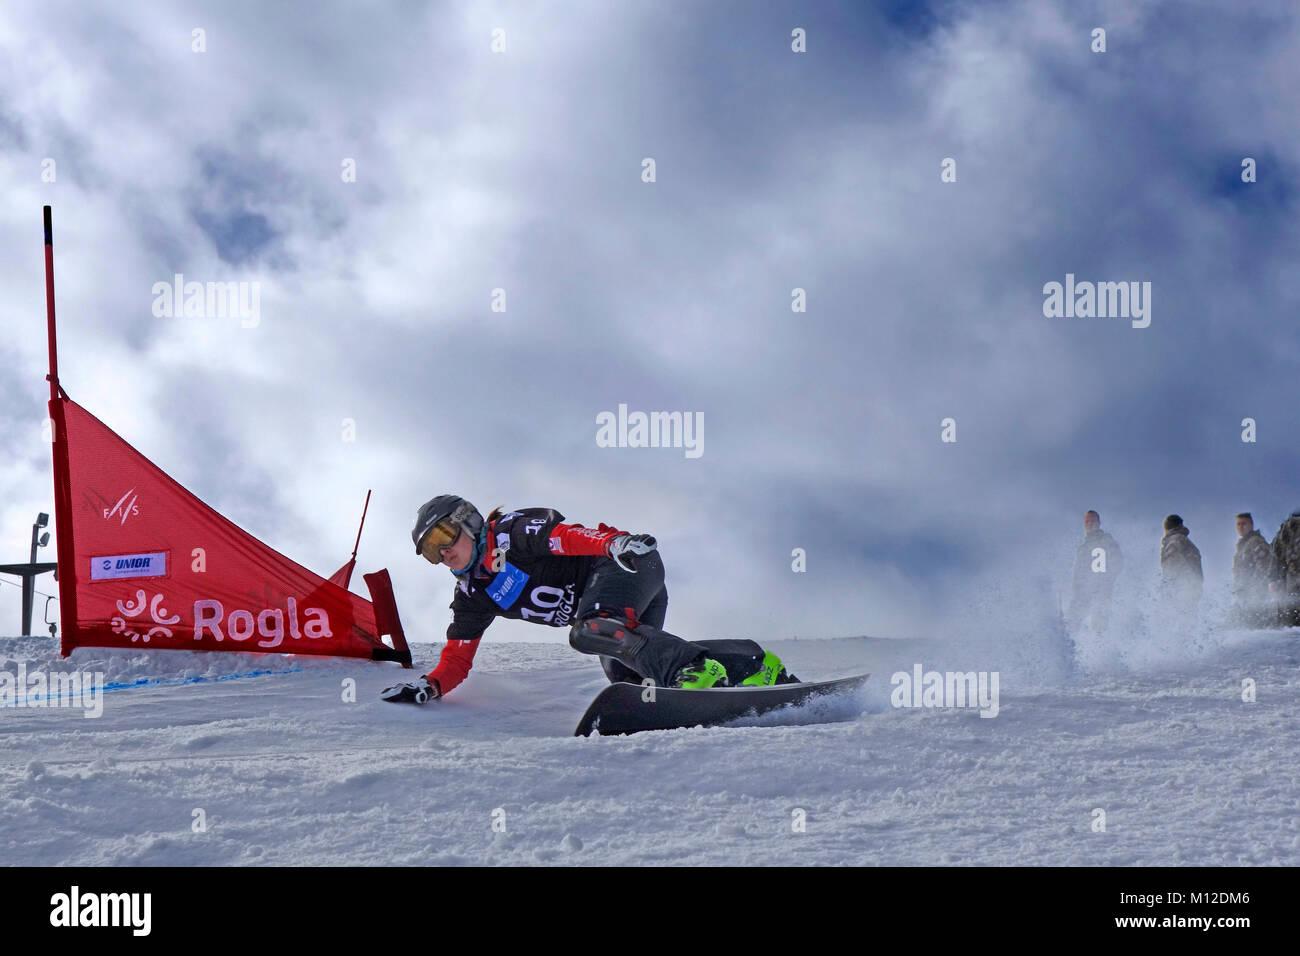 Snowboard Giant Slalom Competition. Rogla ski resort, Slovenia. - Stock Image